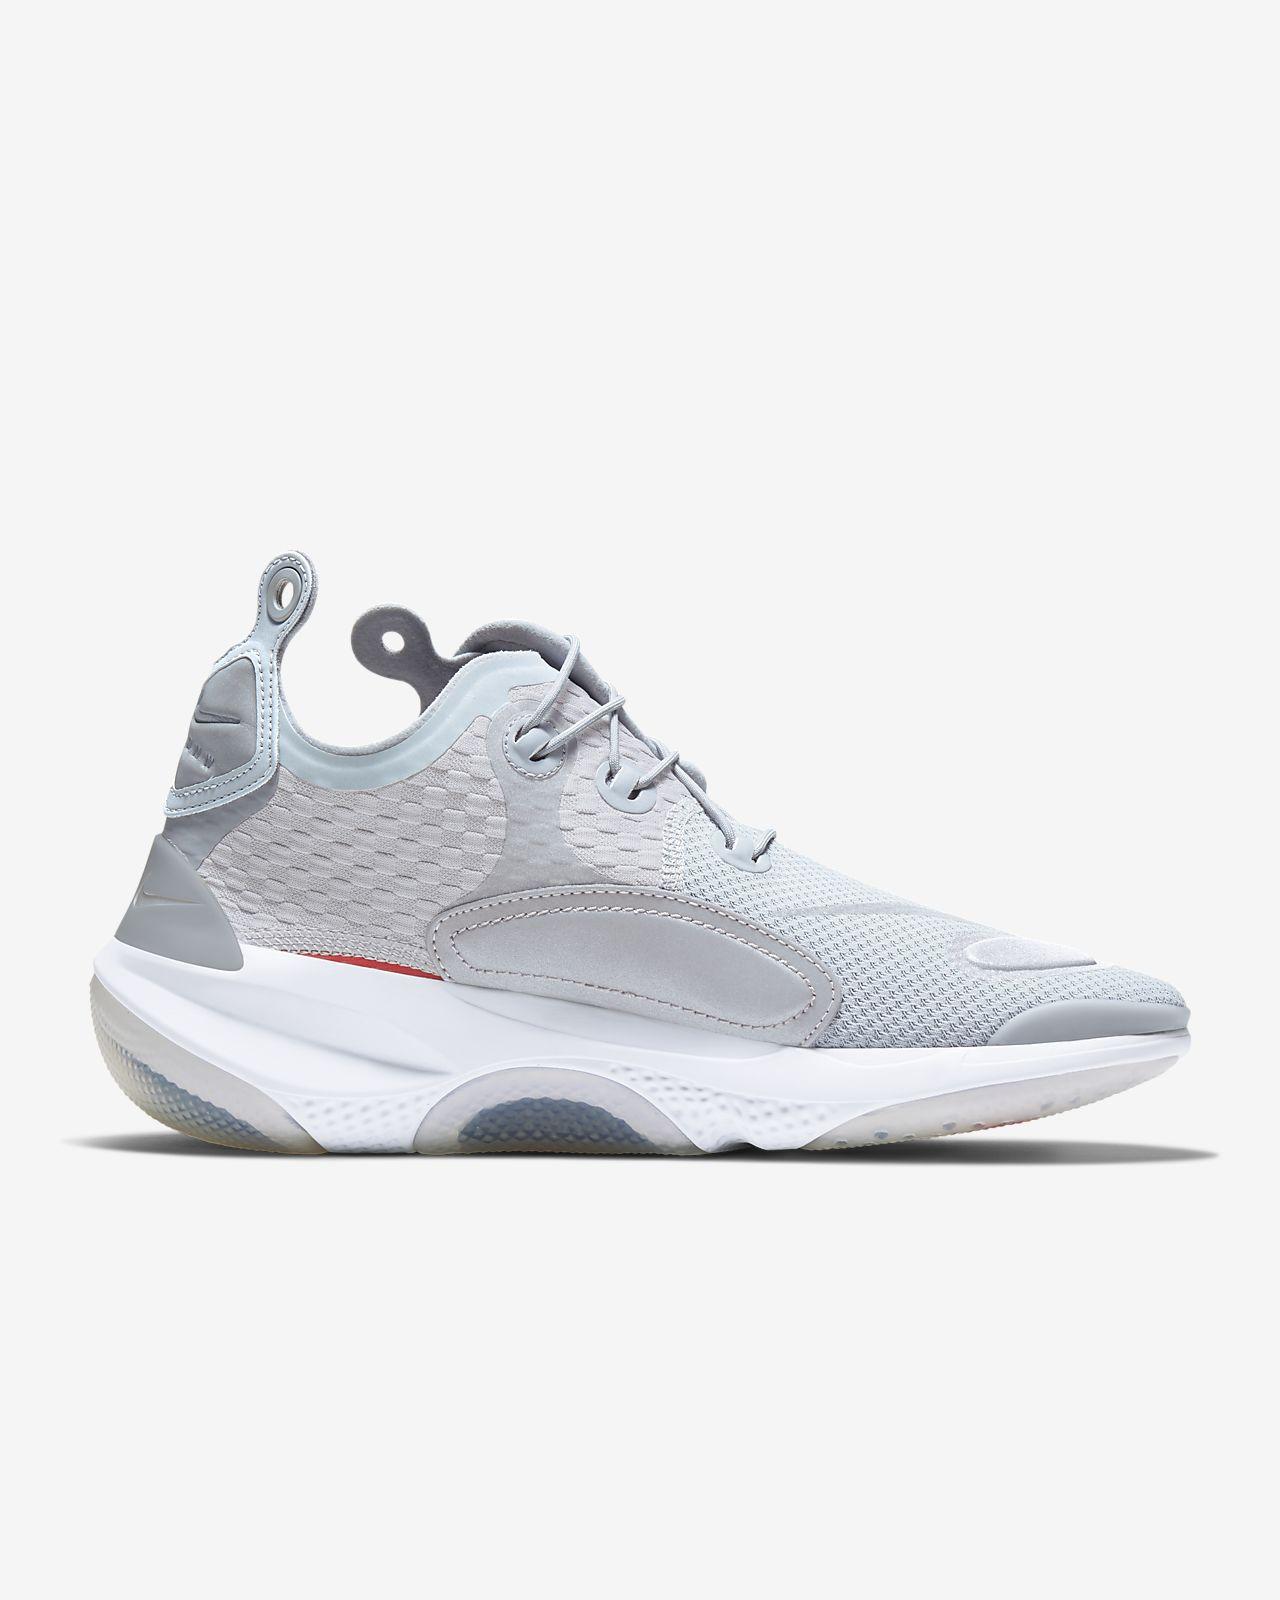 Nike Joyride CC3 Setter MMW Wolf Grey White Black University Red